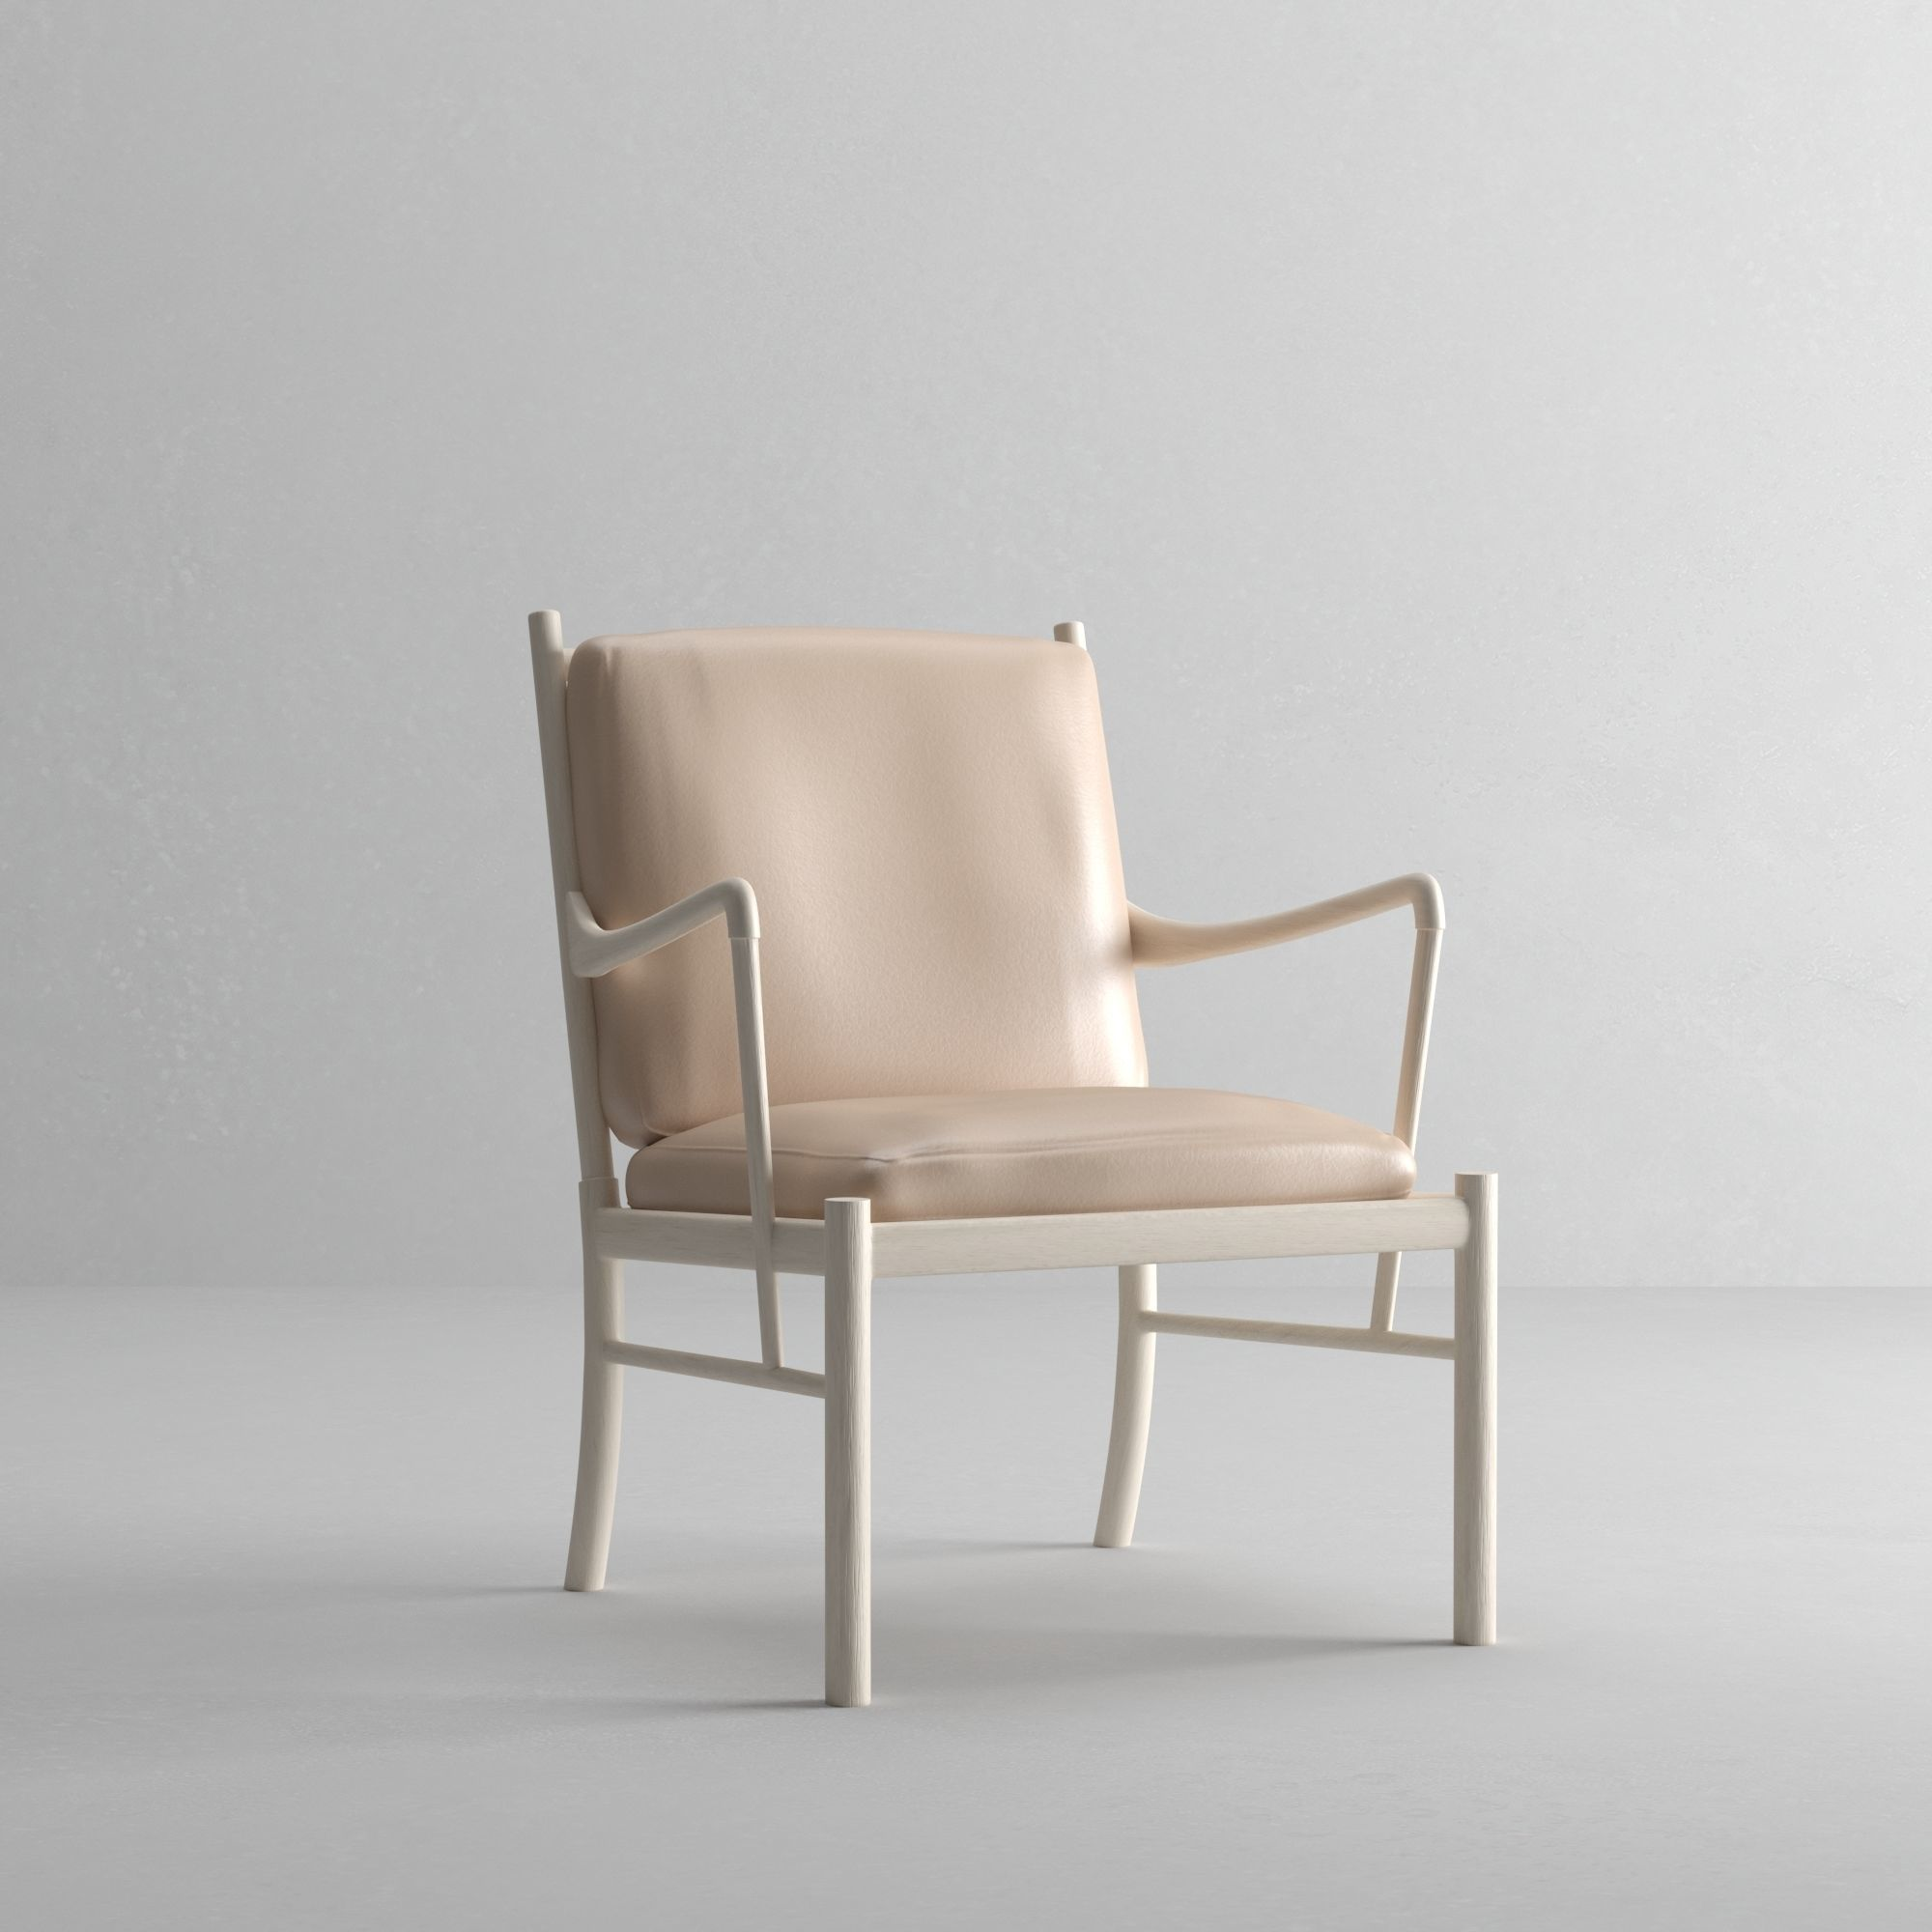 Groovy Carl Hansen Colonial Chair 3D Model Ibusinesslaw Wood Chair Design Ideas Ibusinesslaworg